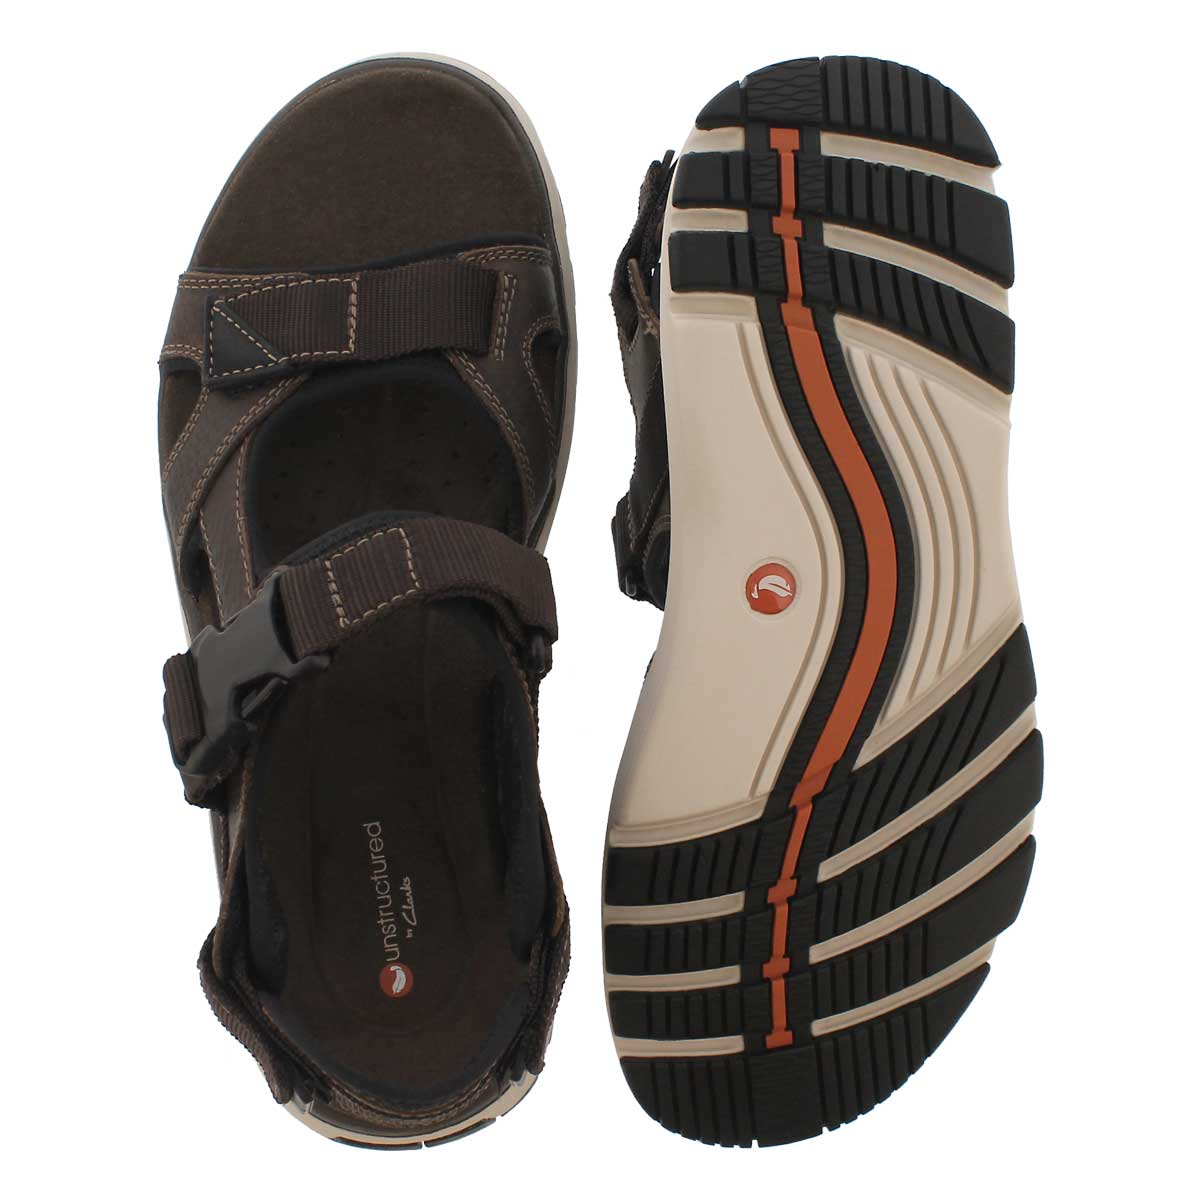 Mns UnTrek Bar olive casual sandal